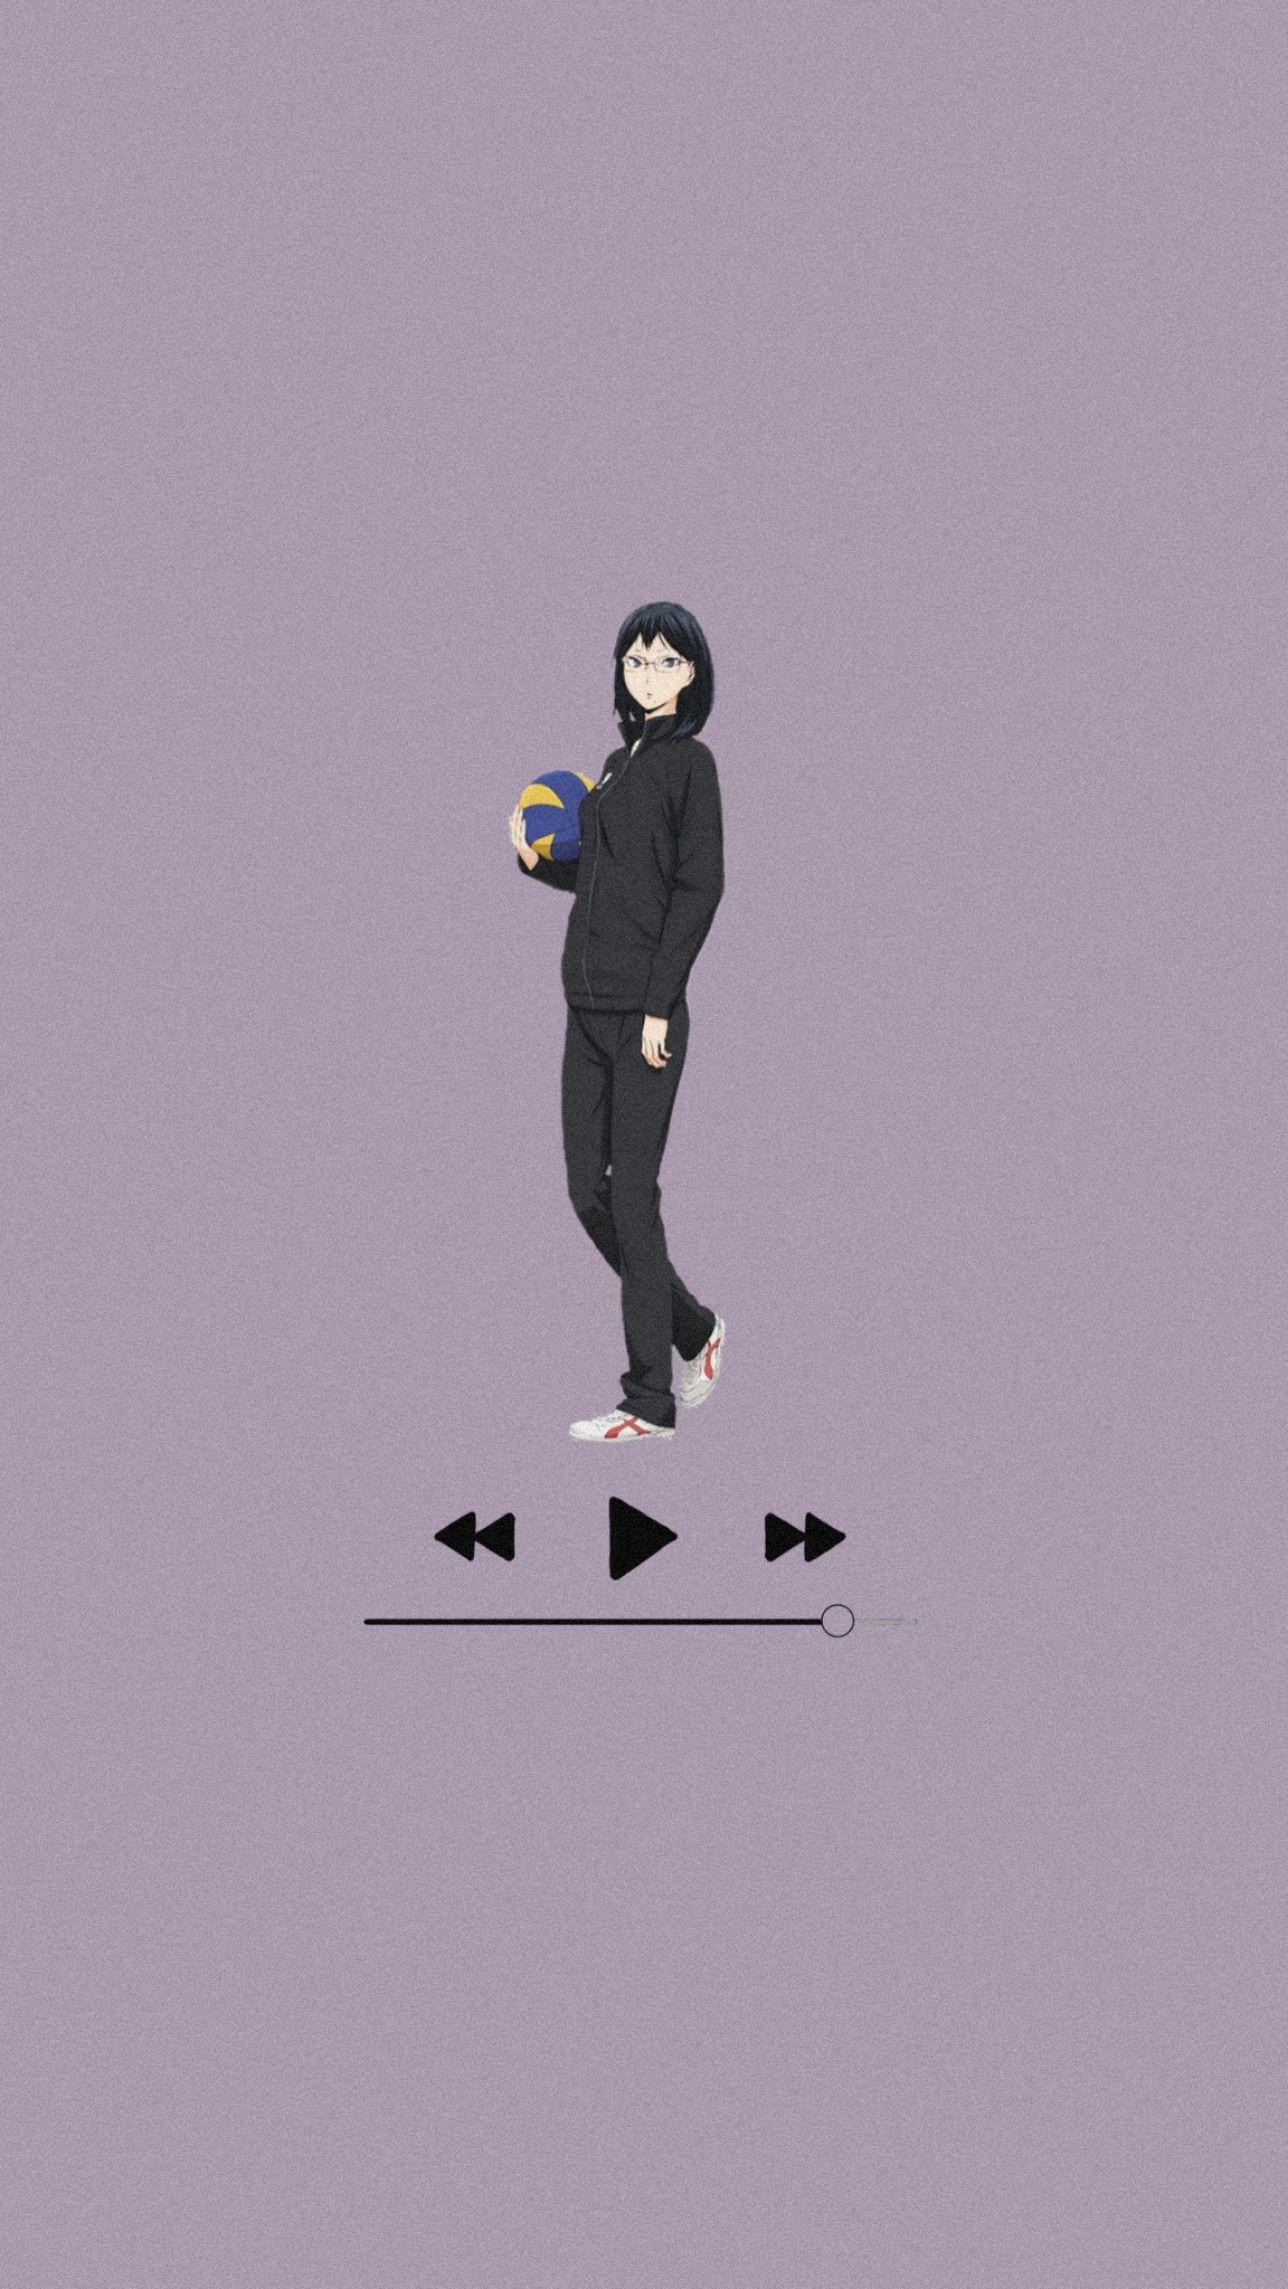 Music Kiyoko Wallpaper Haikyuu Wallpaper Cool Anime Wallpapers Haikyuu Anime Anime music wallpaper mobile